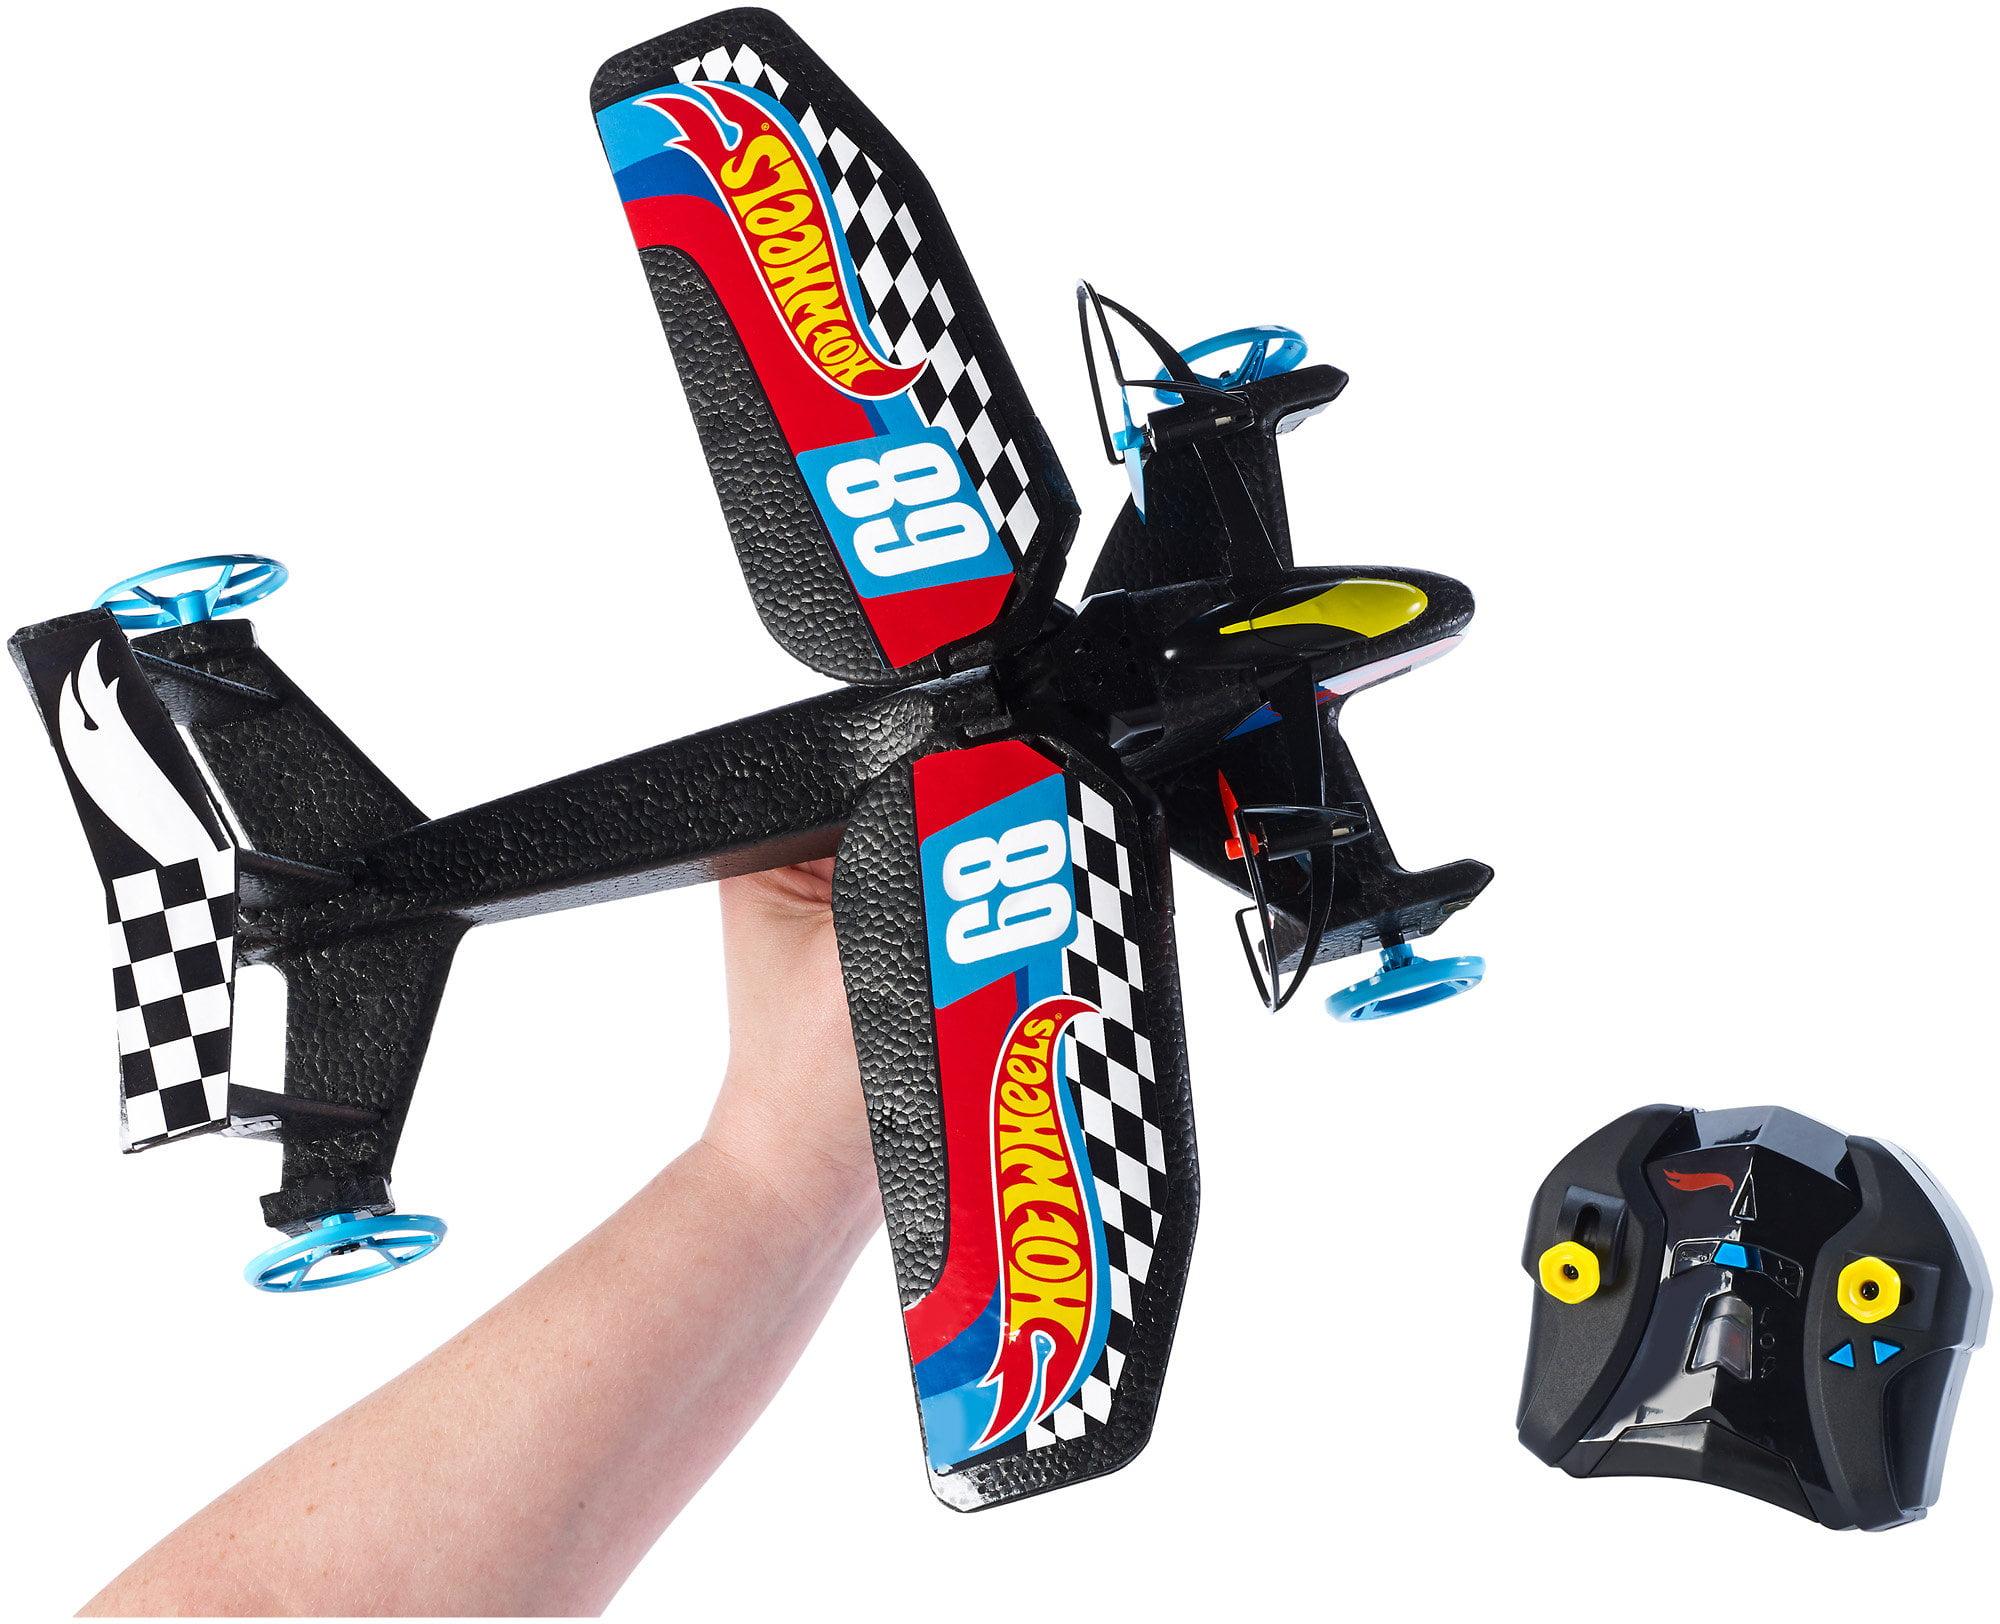 Hot Wheels RC Sky Shock (Race Vehicle) by Mattel